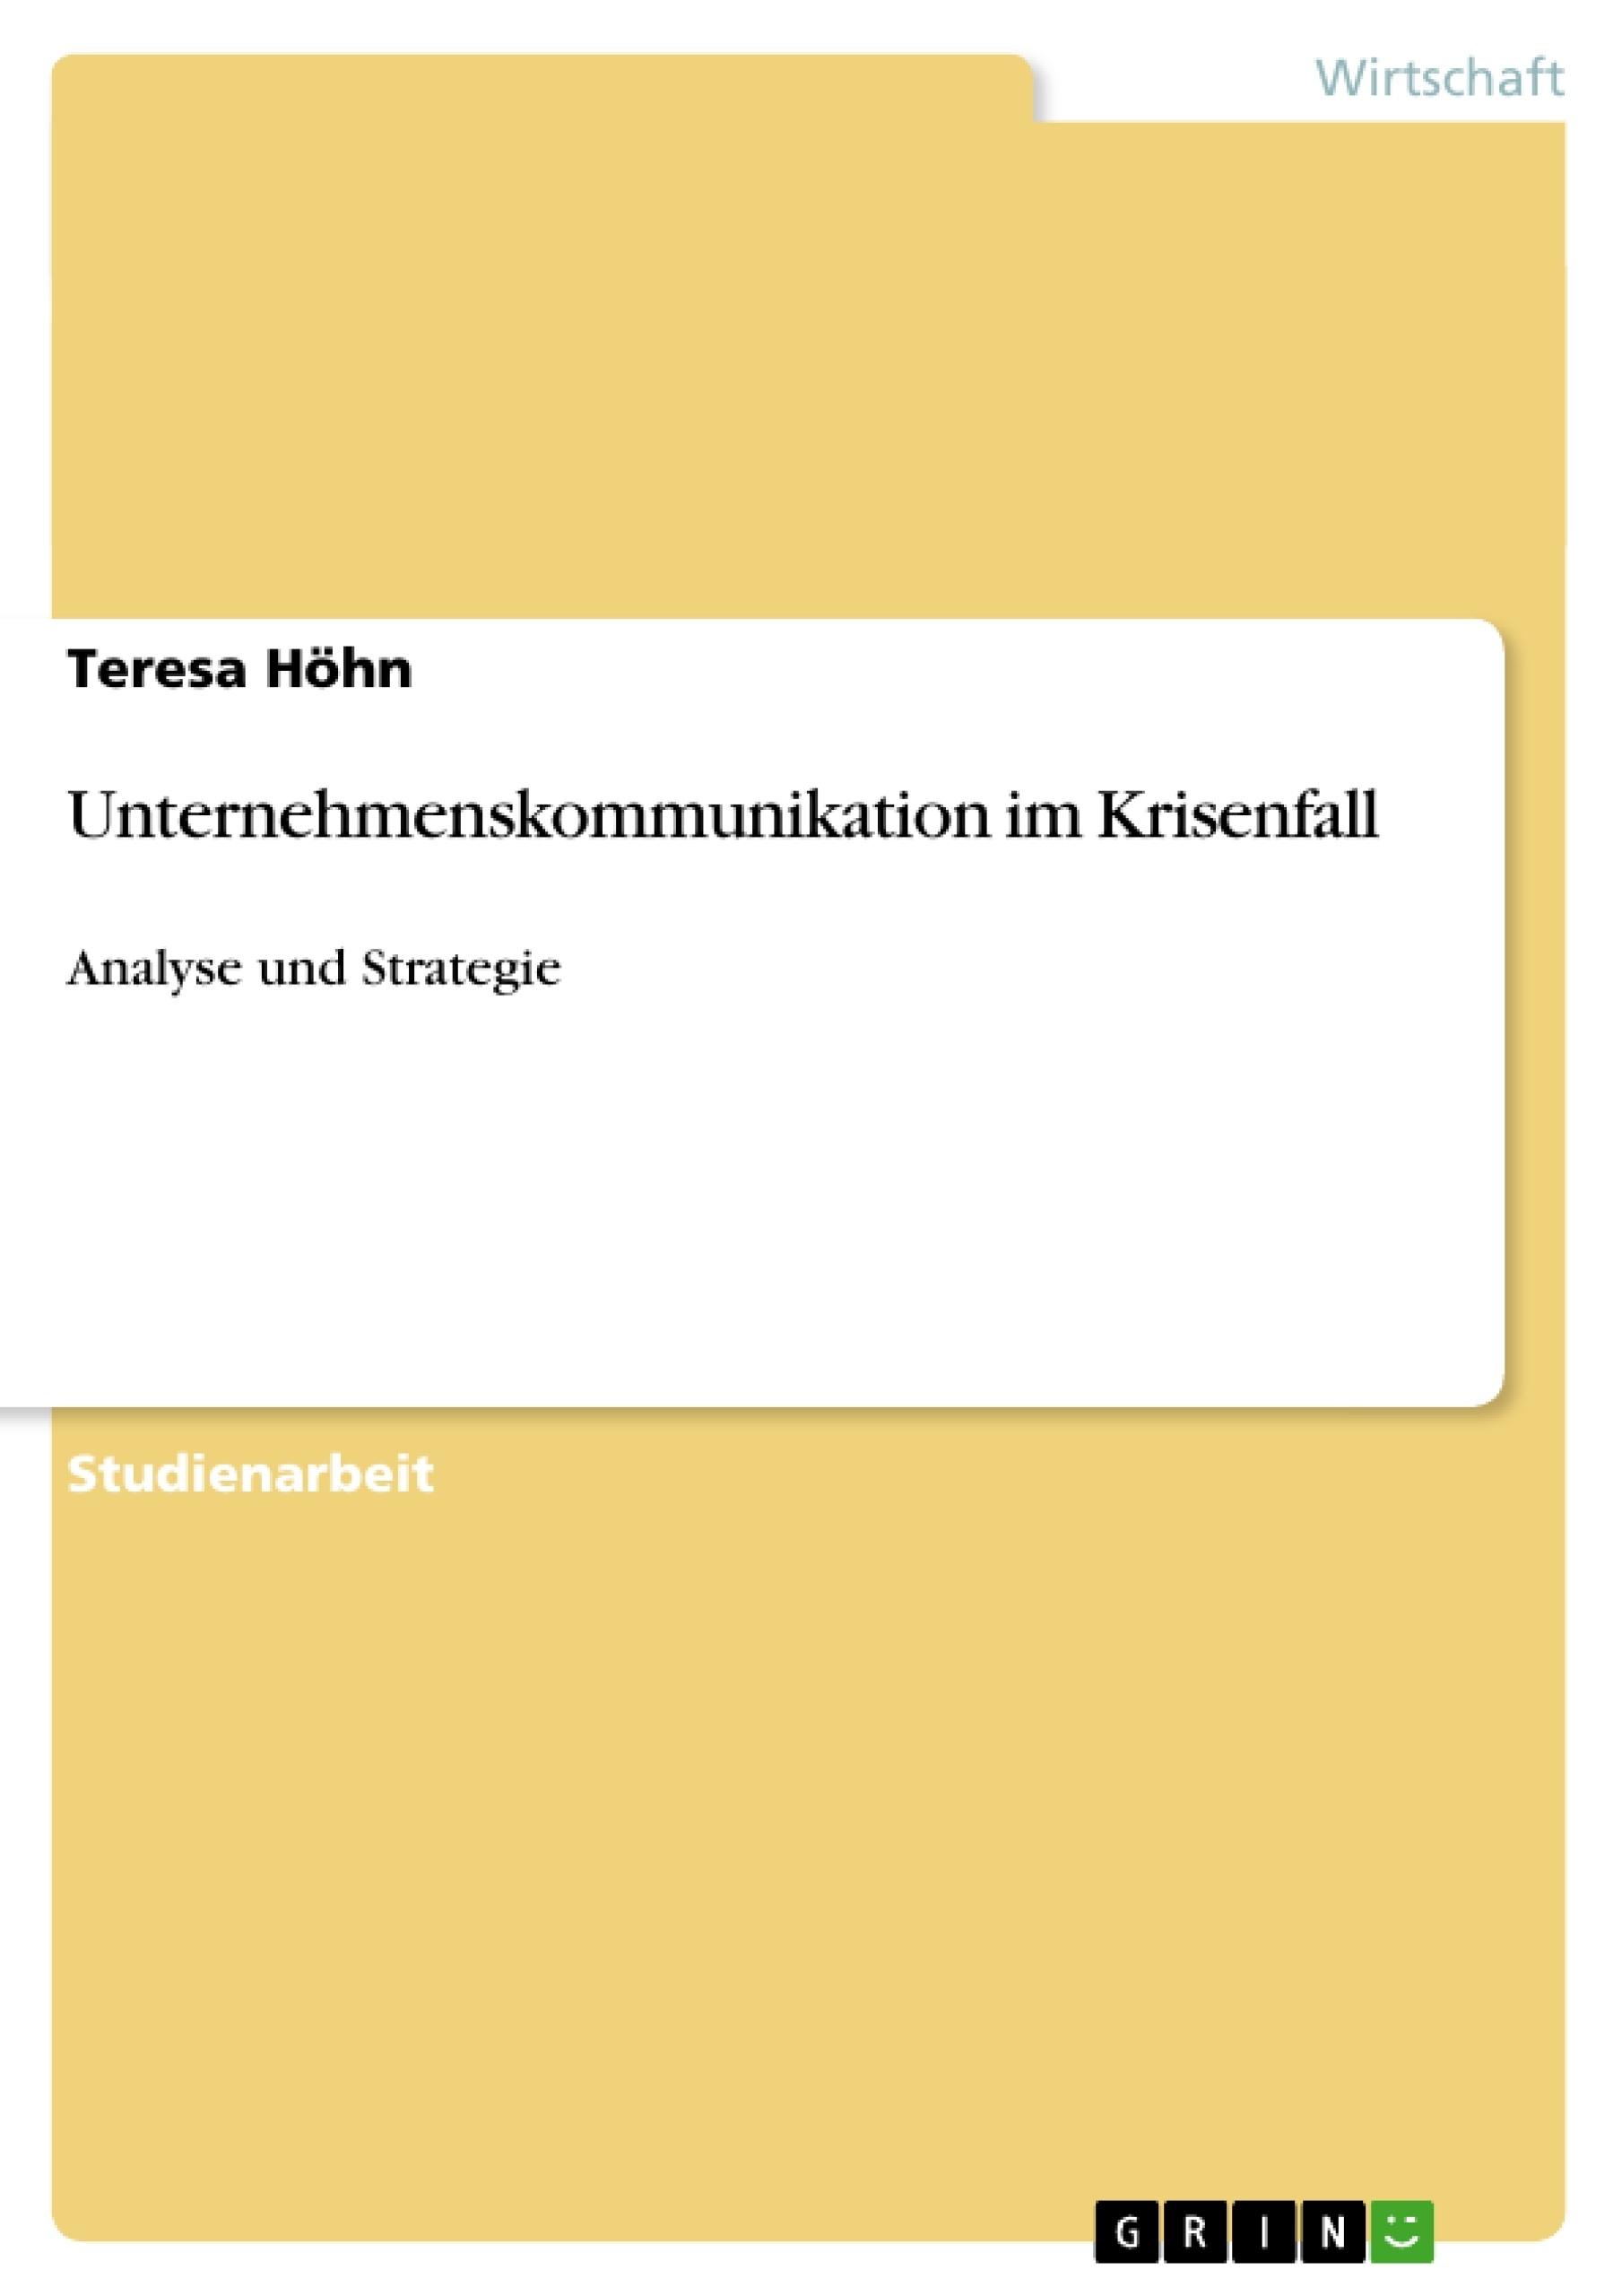 Titel: Unternehmenskommunikation im Krisenfall